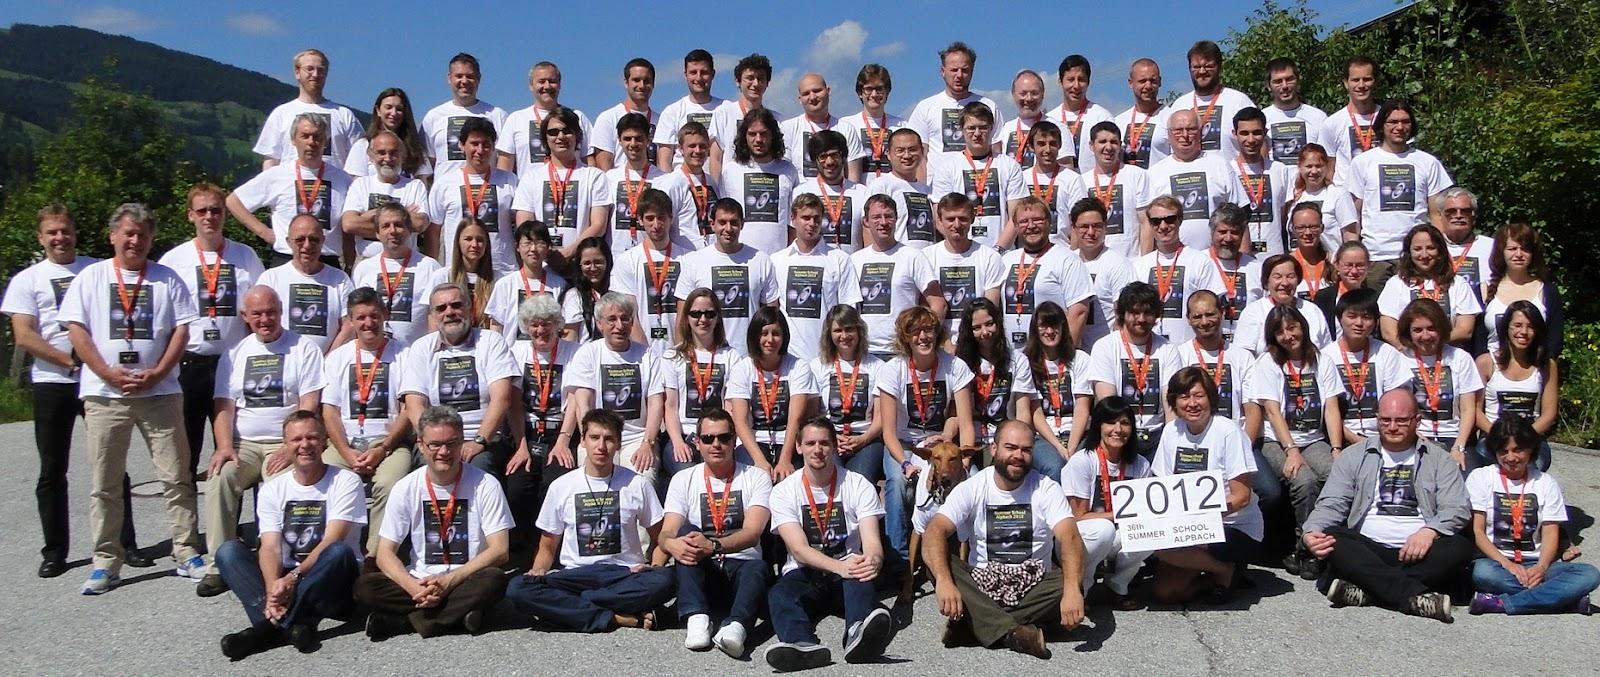 Alpbach Summer School 2012 – Dr Jane MacArthur